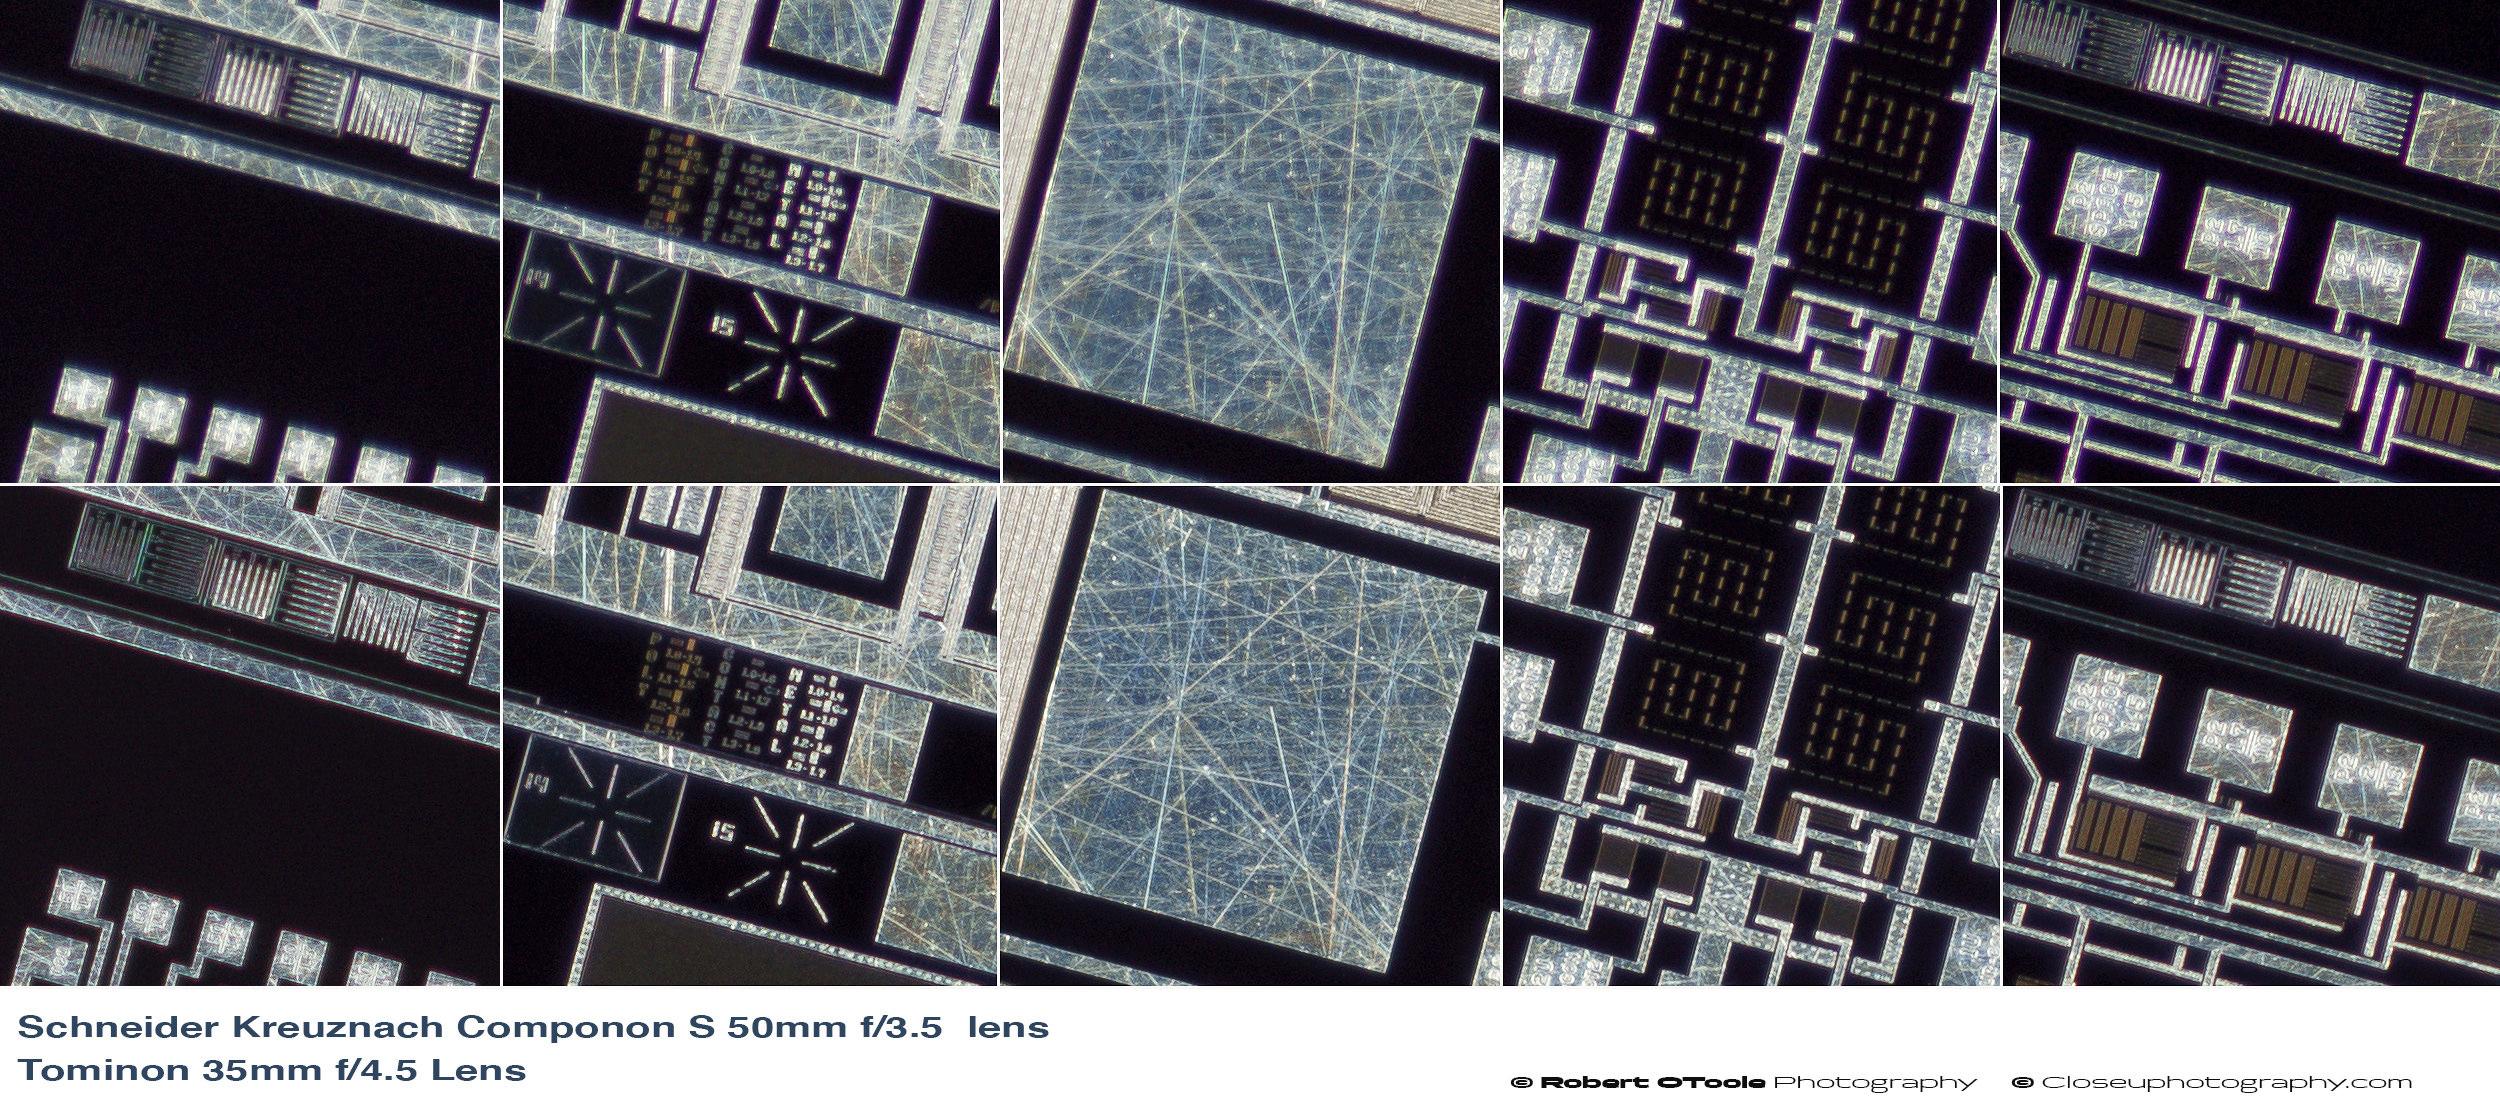 Schneider-Kreuznach-Componon-S-50mm f3.5-lens-v-Tominon-35mm-f4.5-Lens-Closeuphotography.JPG